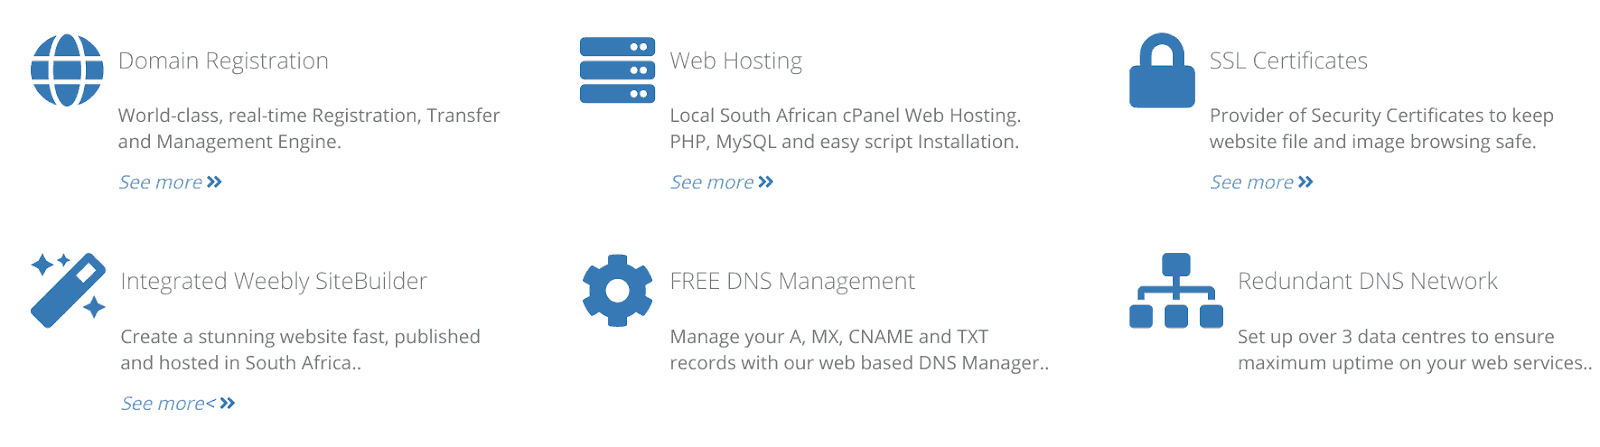 Register Domain SA